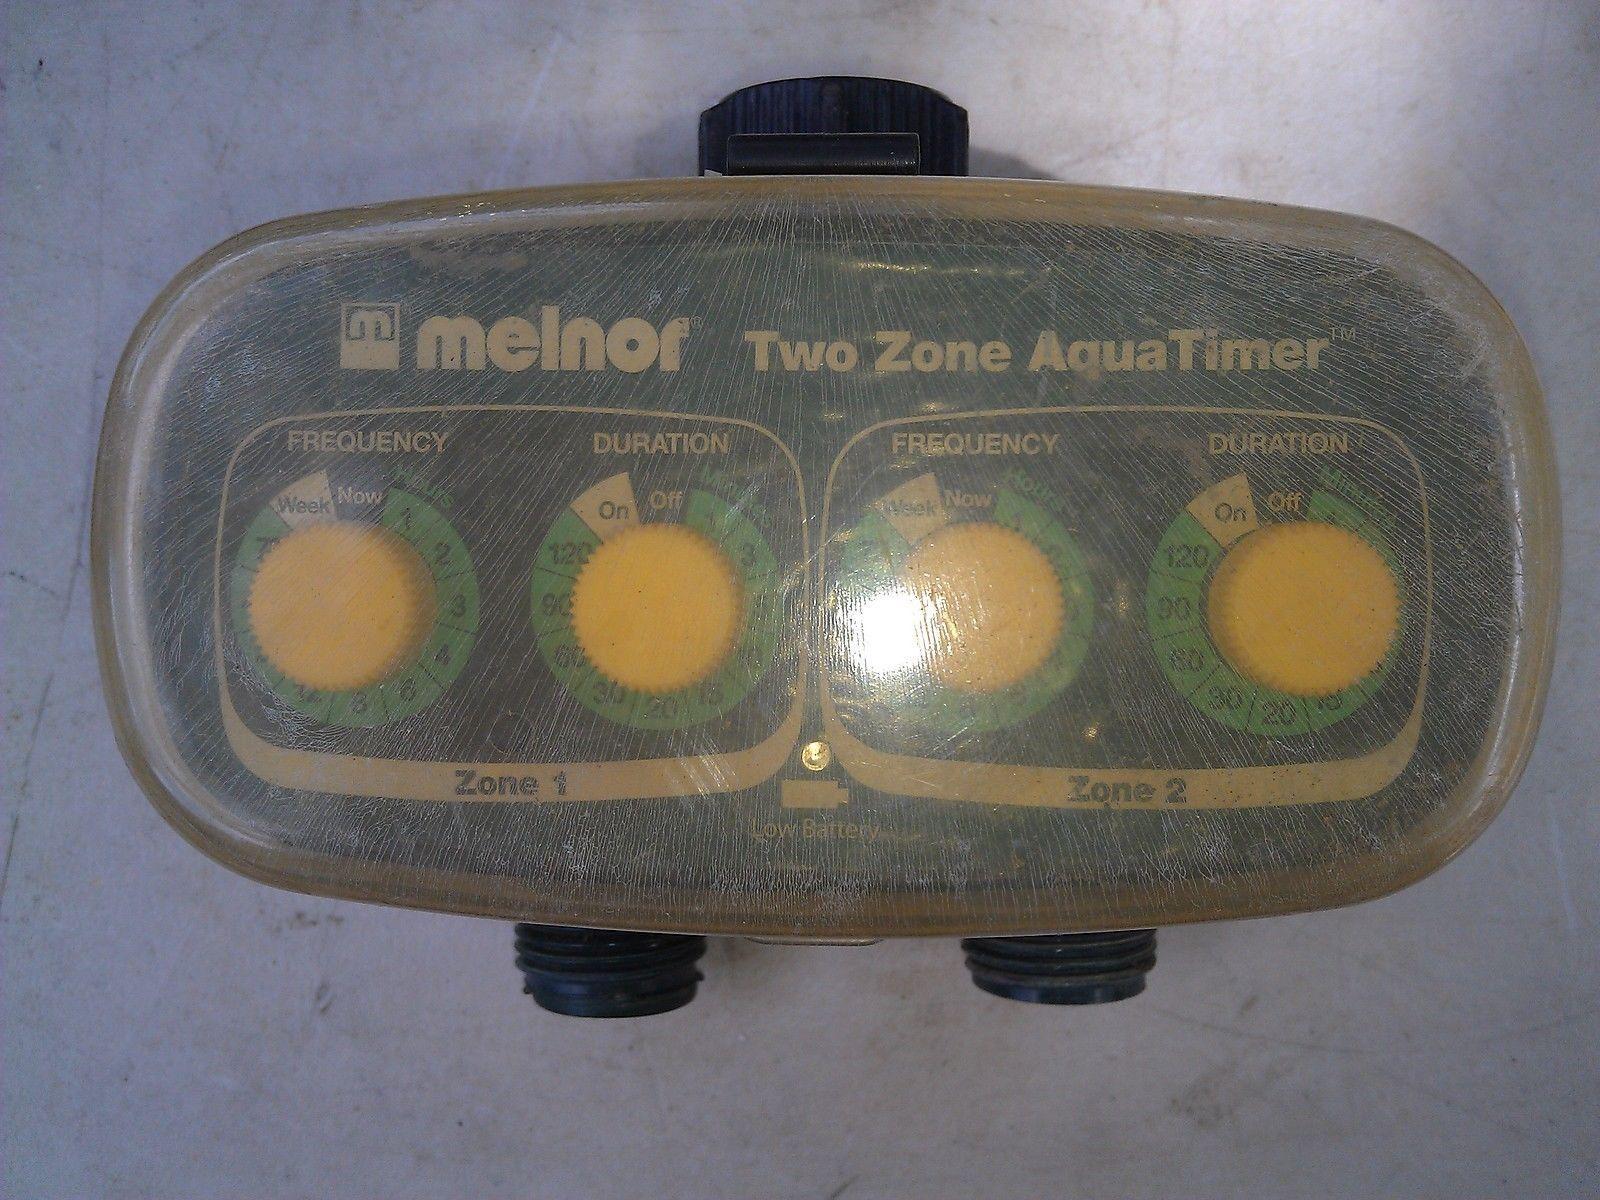 7tt48 Melnor Sprinkler Timer Untested No Warranty Return Parts Repair 8 68